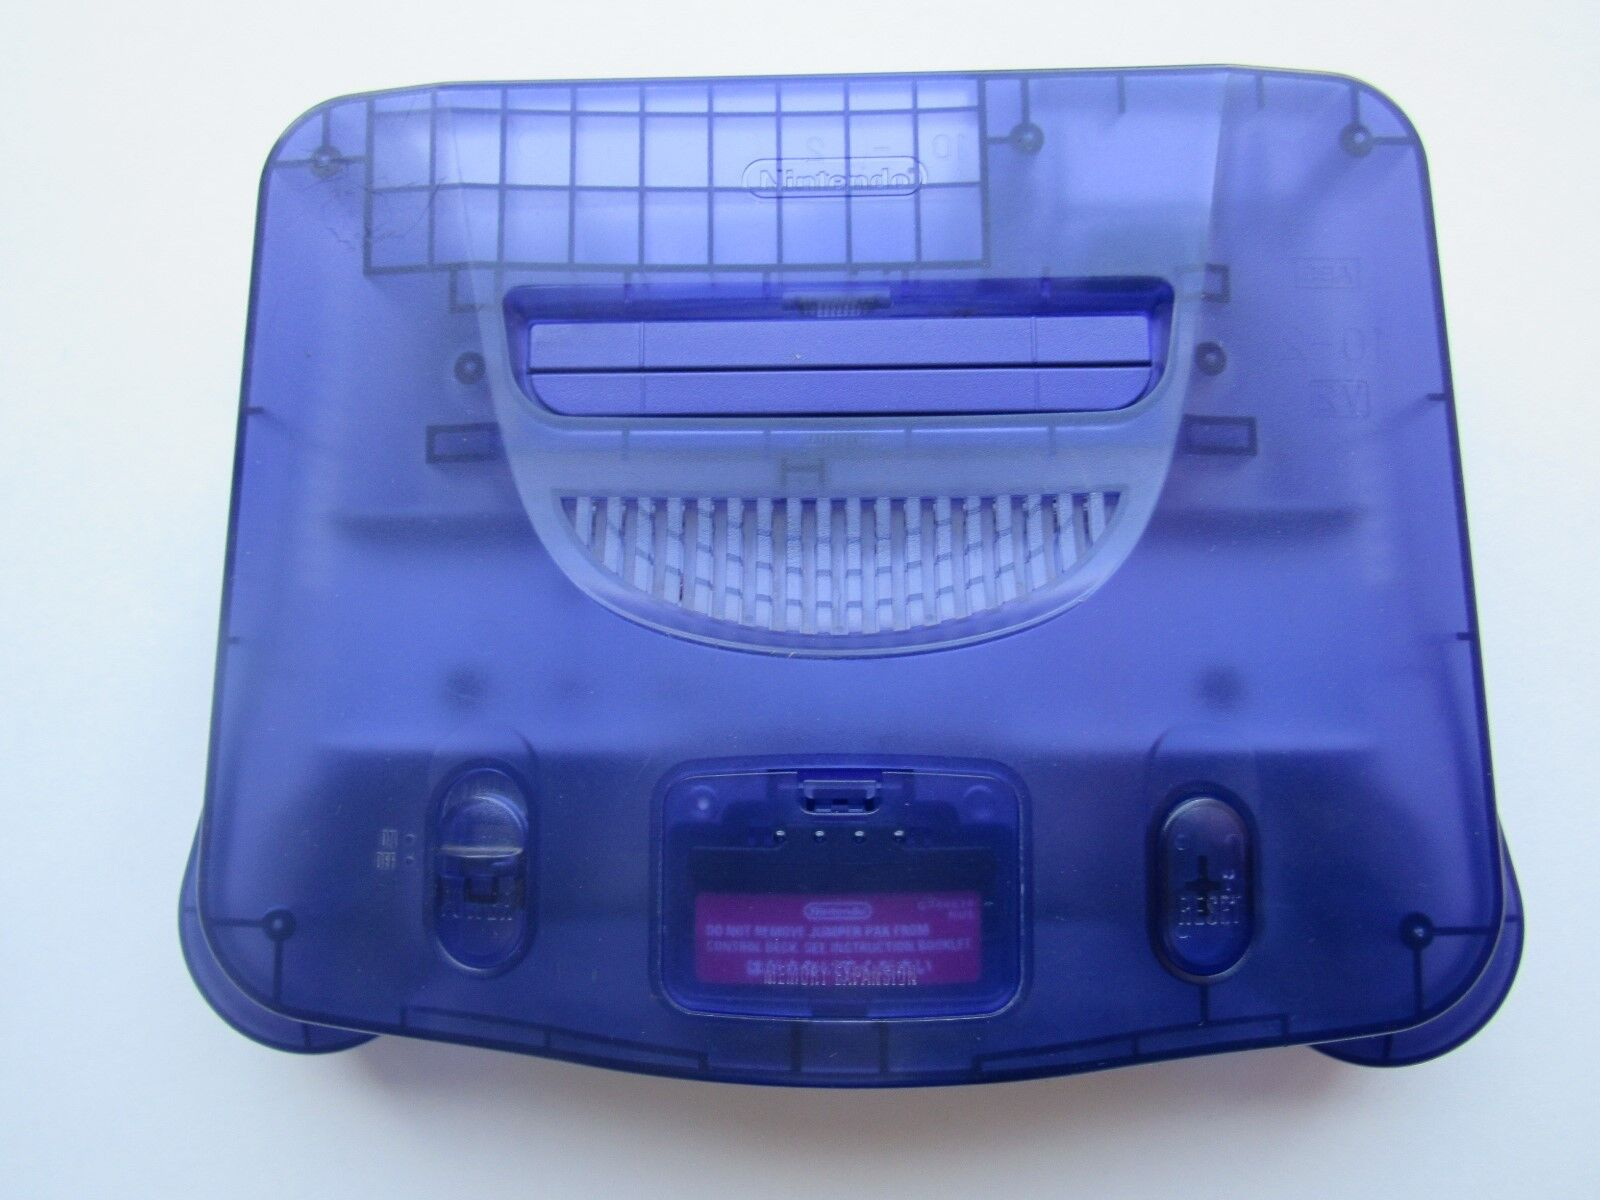 *GOOD* Nintendo 64 N64 OEM Video Game Console System Funtastic Pokemon Gold Rare Grape Purple *Console & Jumper Pack